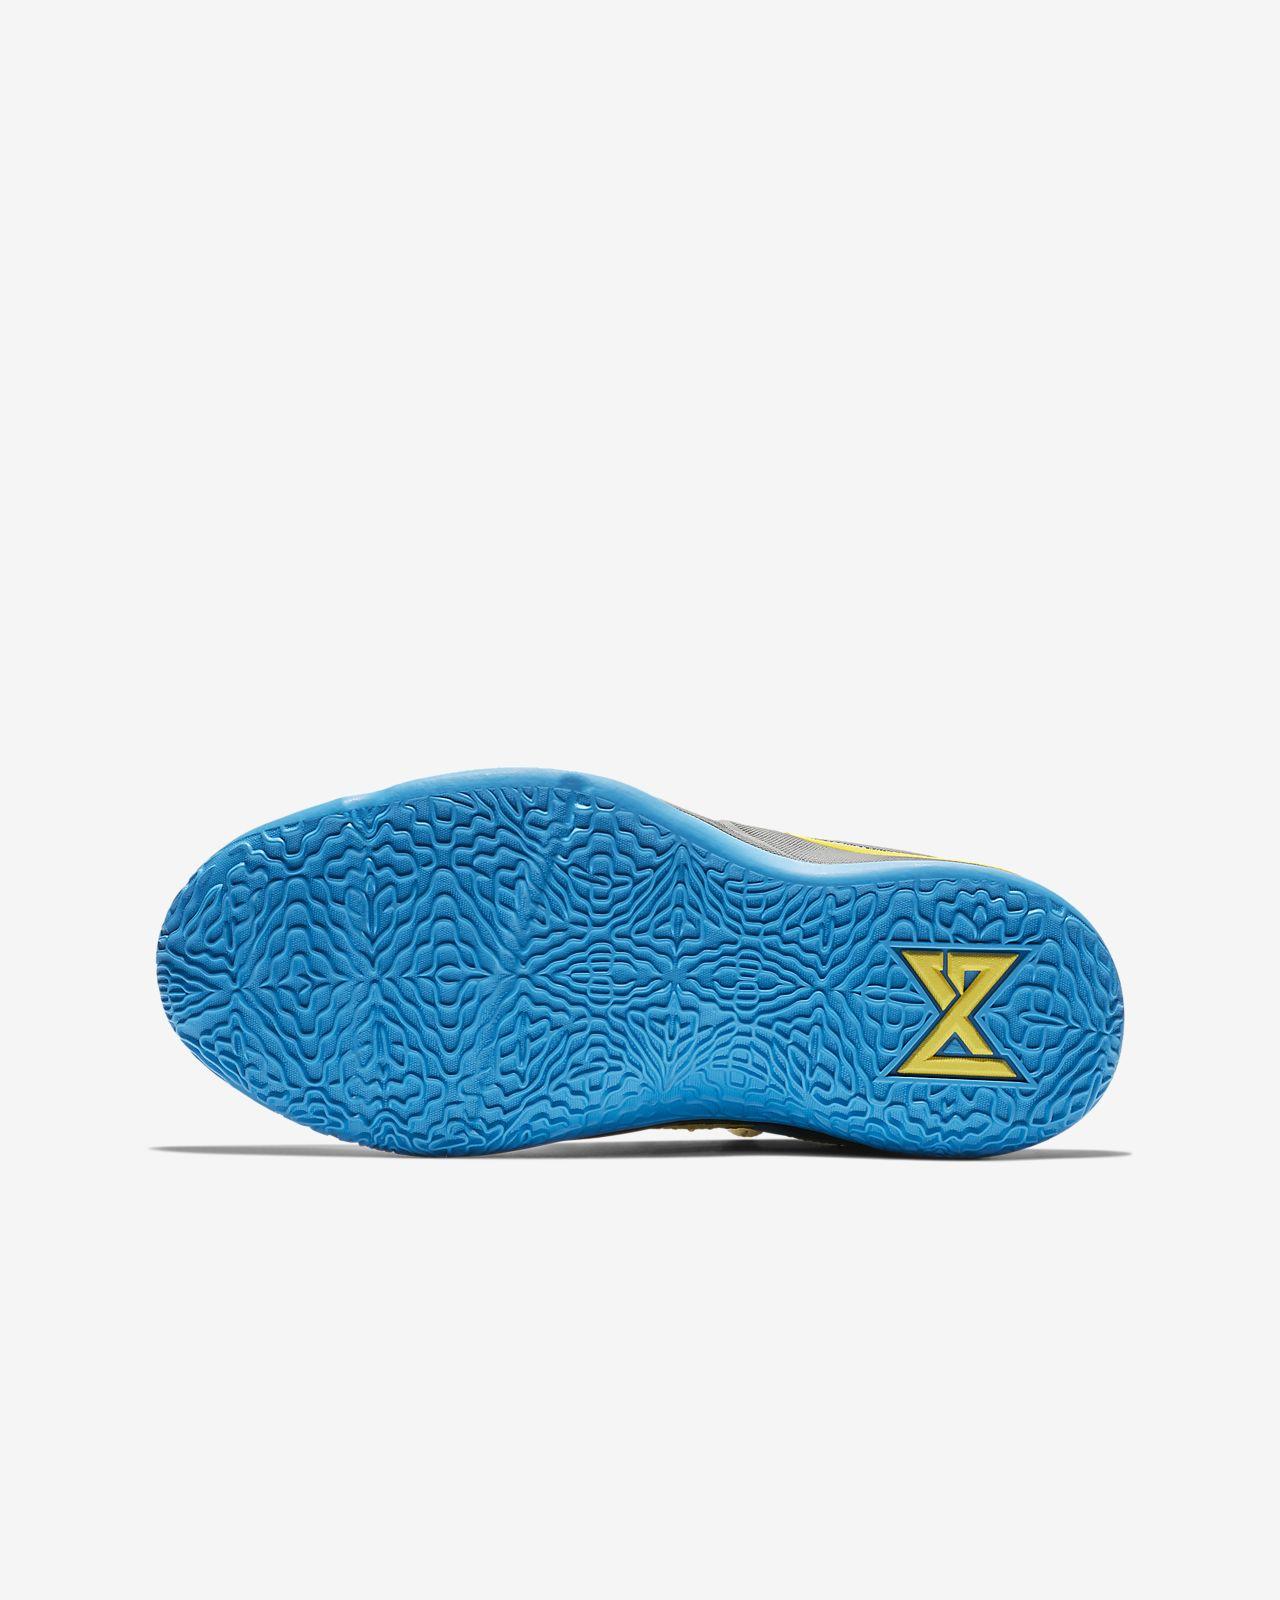 online store 6f05c 08473 ... PG 2.5 Big Kids  Basketball Shoe